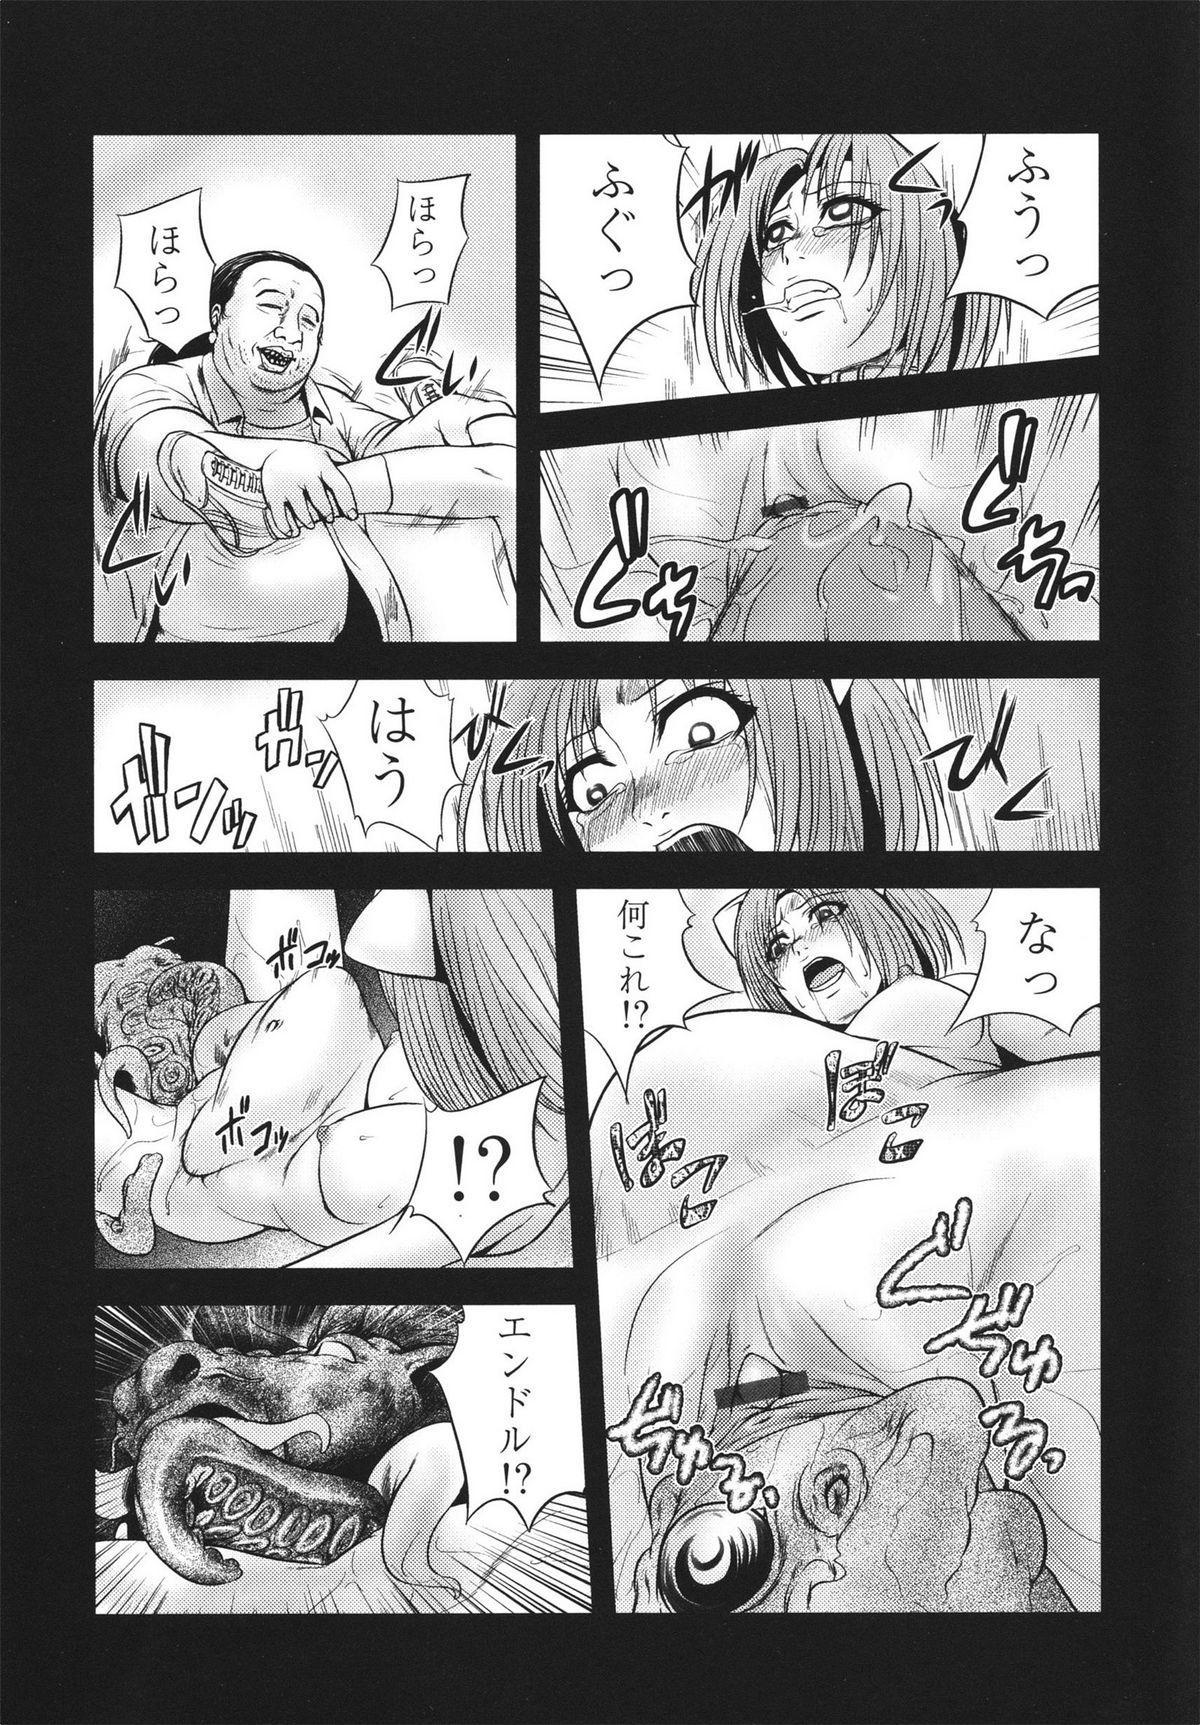 [Kawazuko Chouji] m7 -Minor Seven- Jou 187